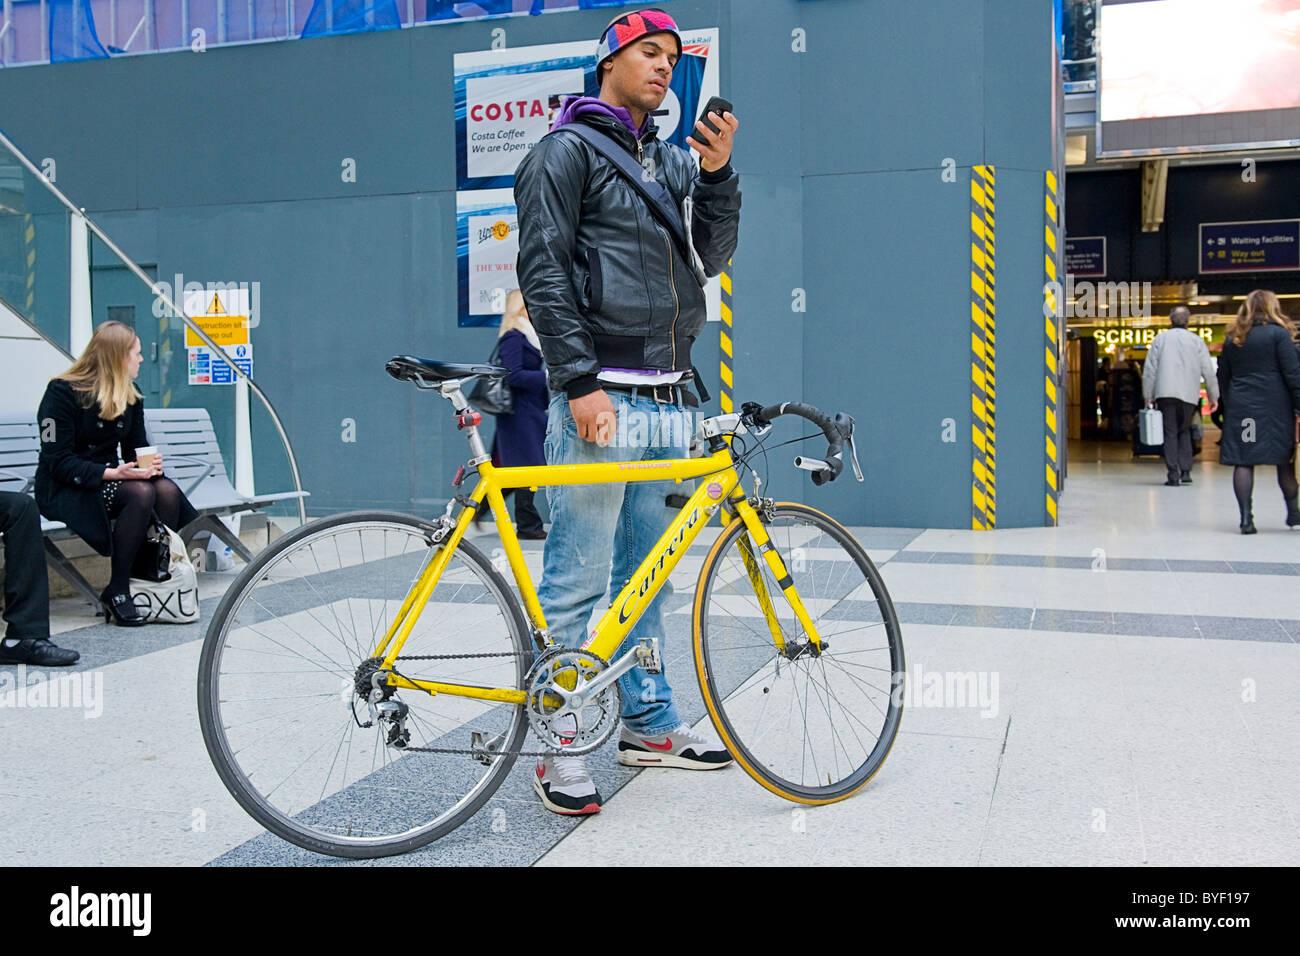 Carrera Bike Stock Photos & Carrera Bike Stock Images - Alamy